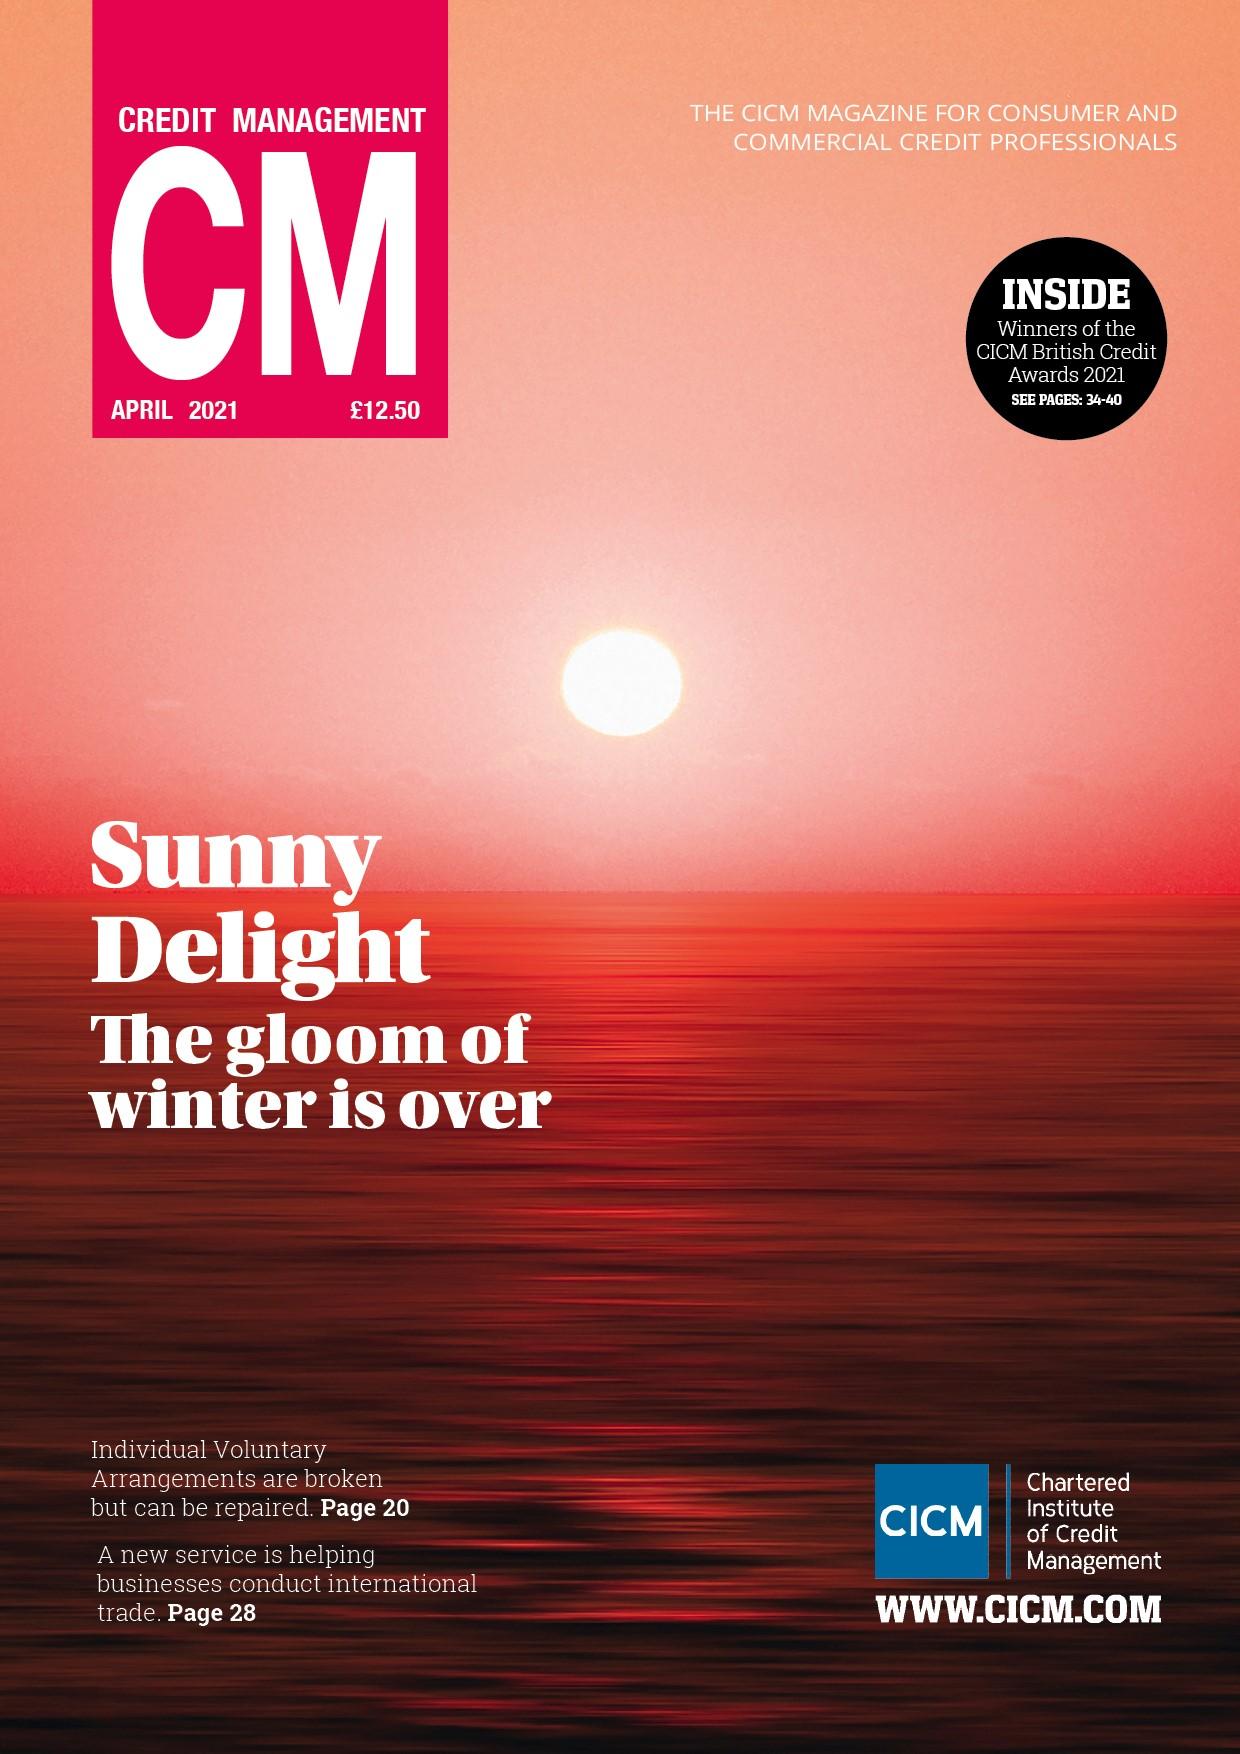 Credit Management Magazine